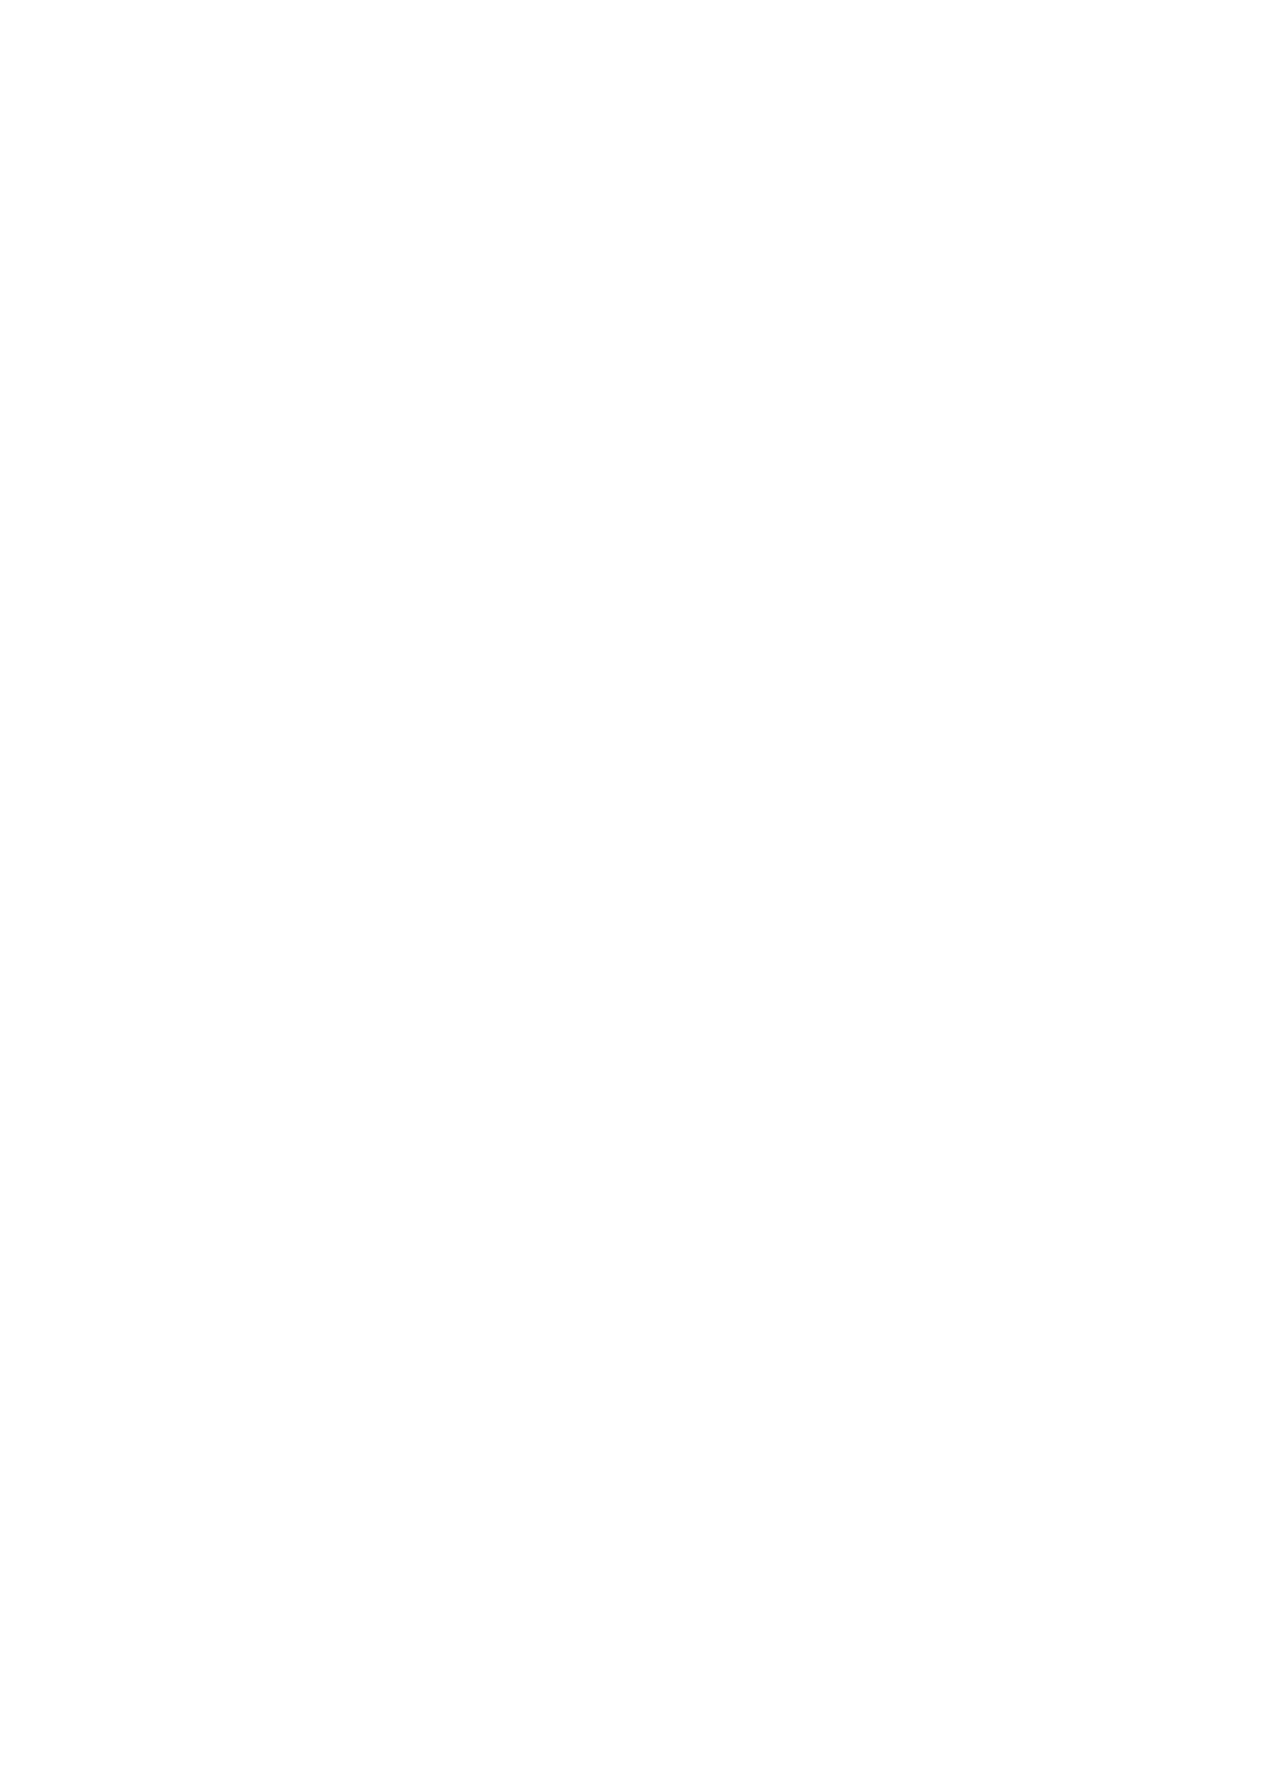 [Purin Kai Yoghurt (Chiri)] CxMxK NOTE X -cross- Soushuuhen [Digital] 1